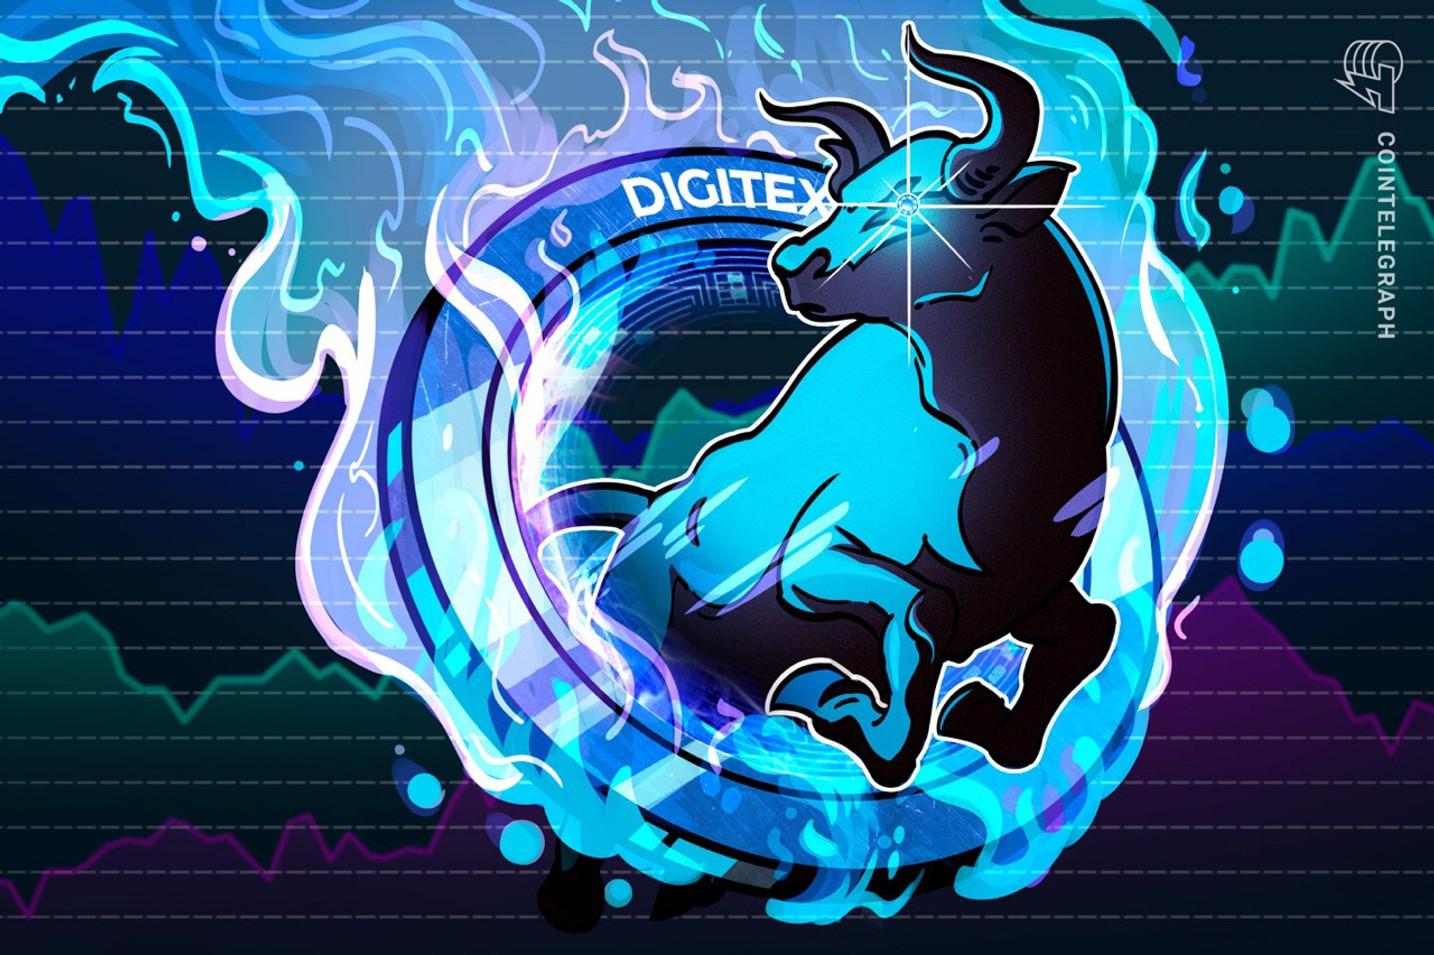 Bitcoin Futures Exchange Announces a 100-Day Trading Battle